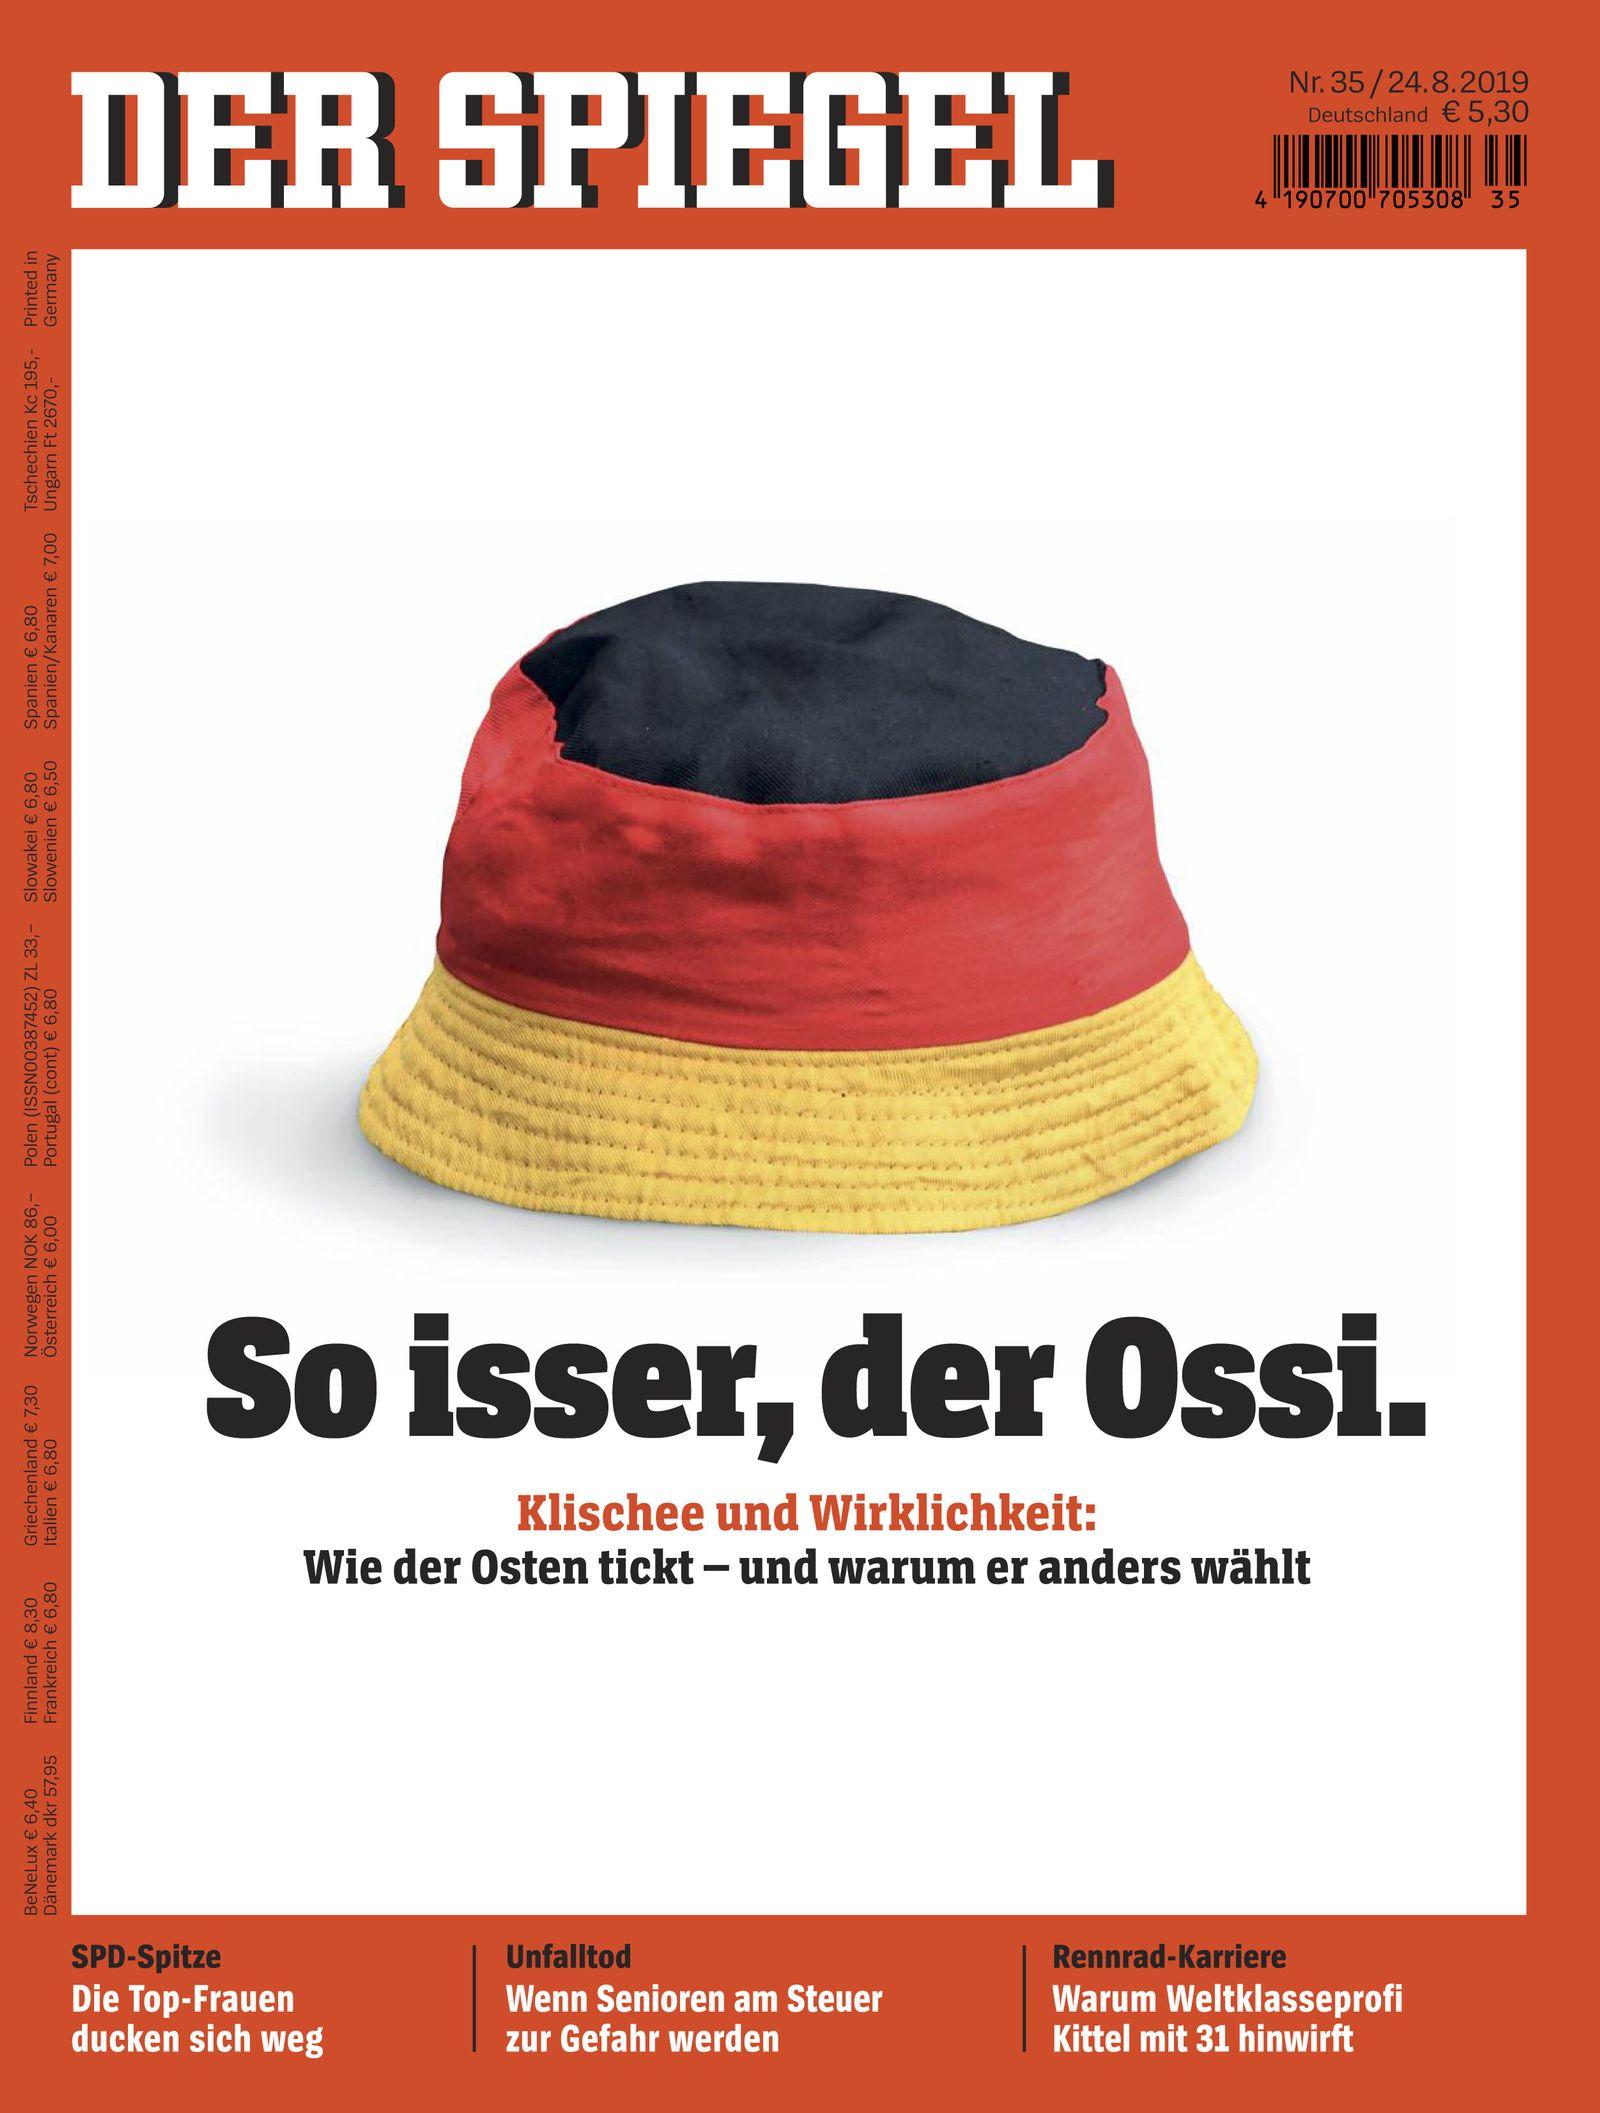 SPIEGEL-Cover 35/2019 - So isser, der Ossi